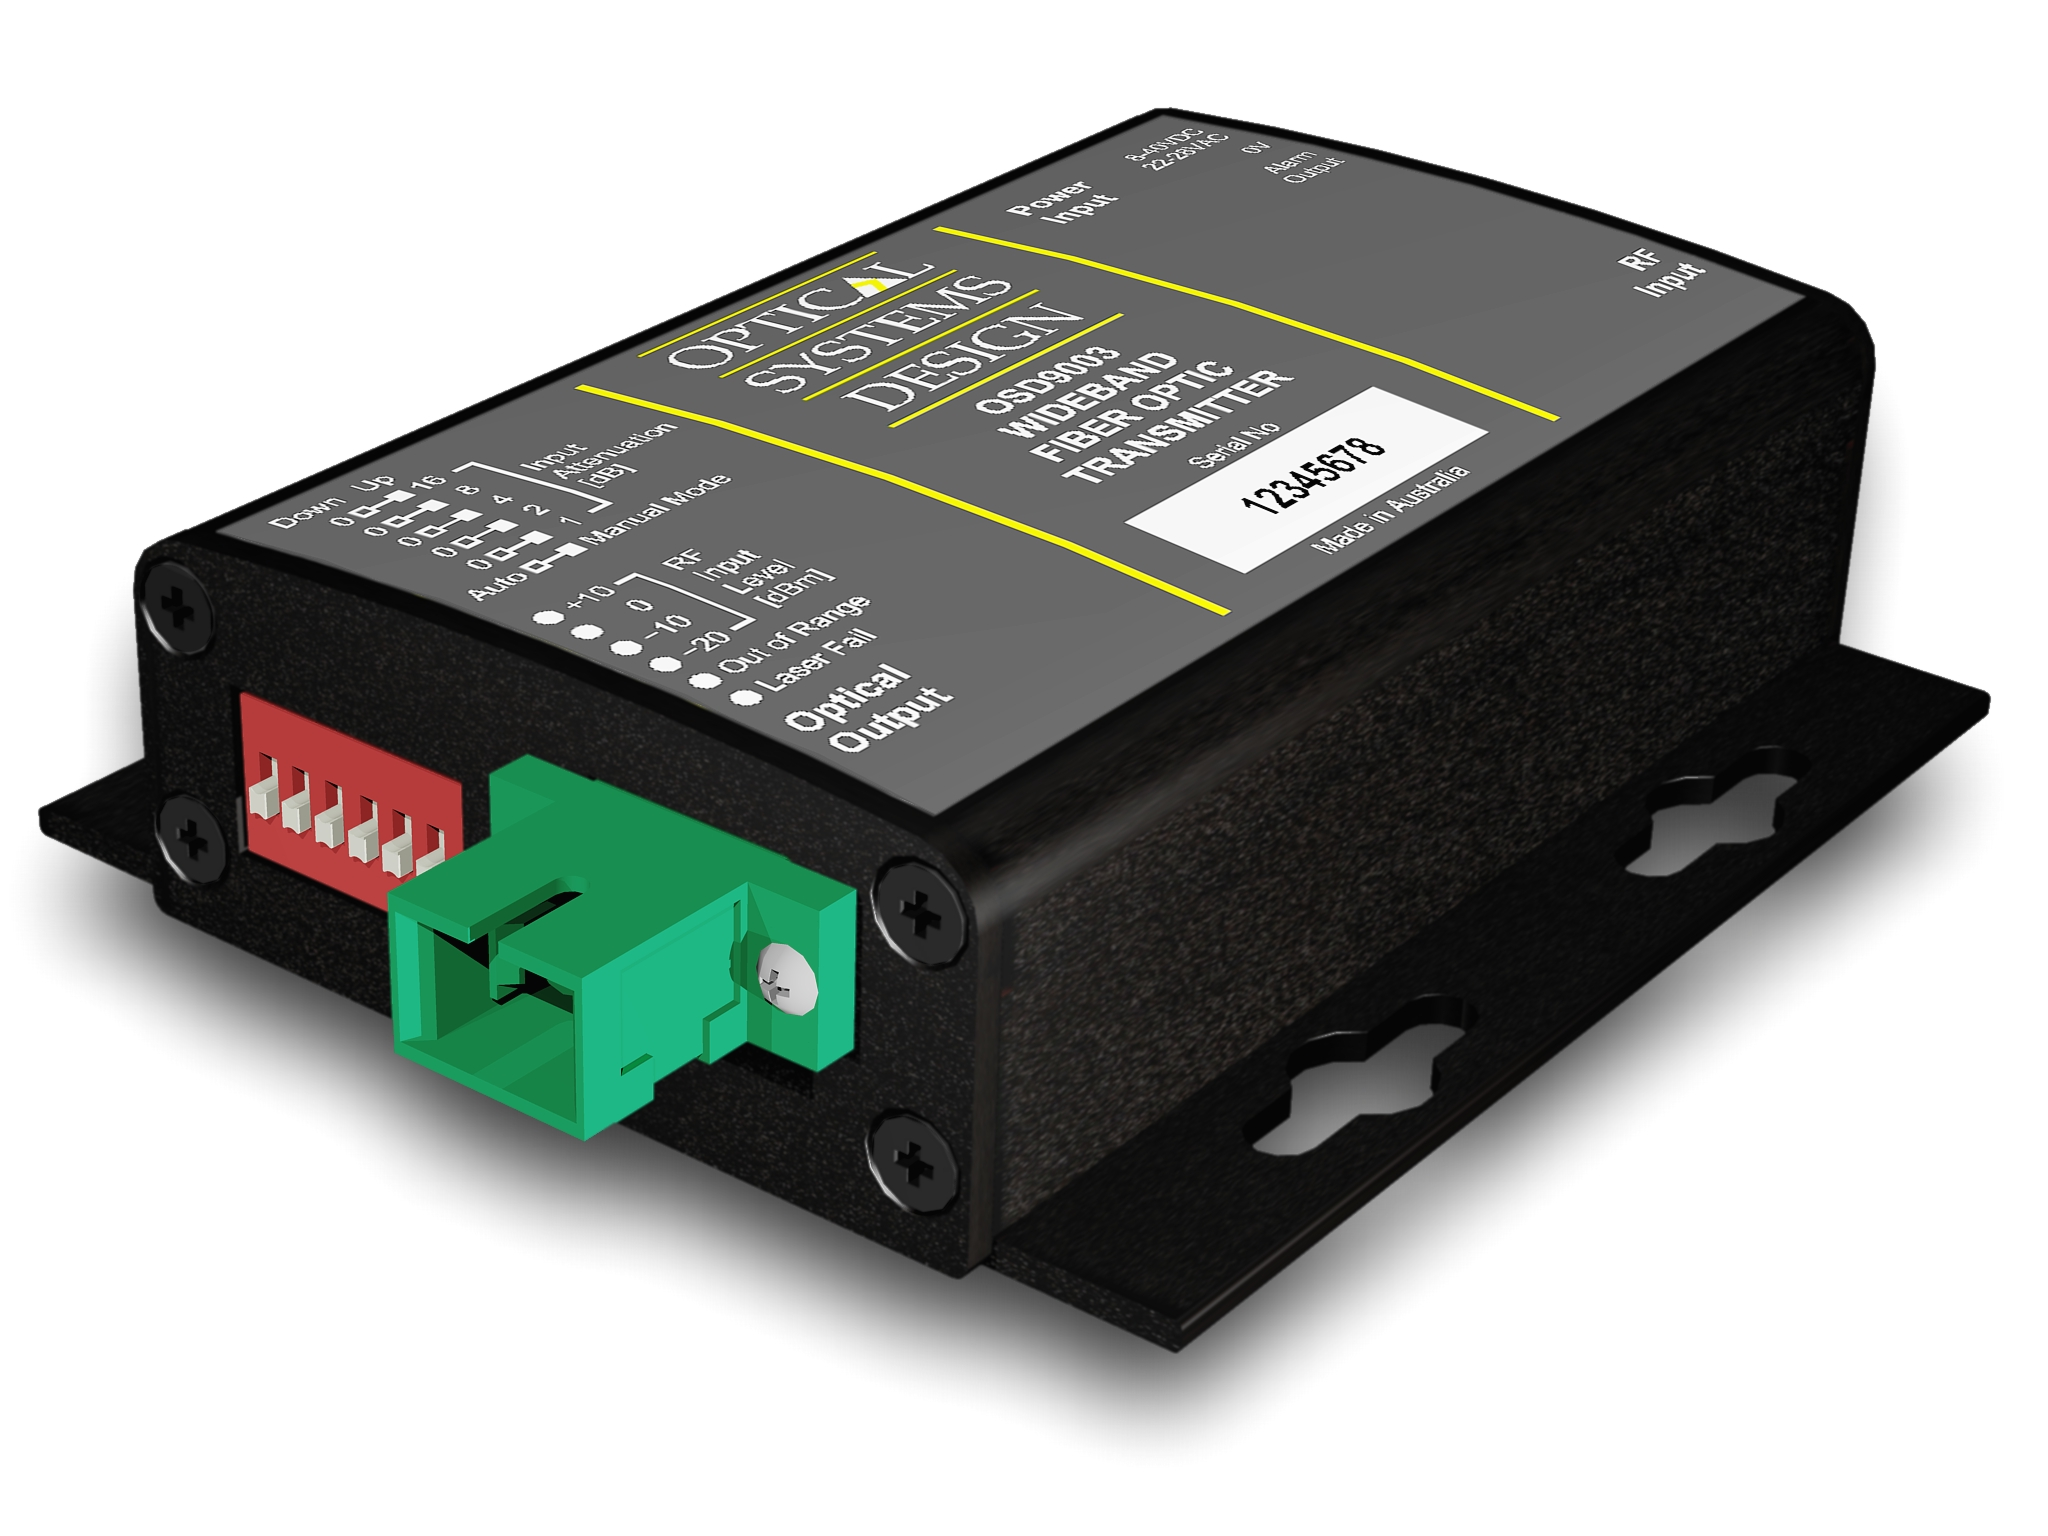 OSD9003 IMG (1)